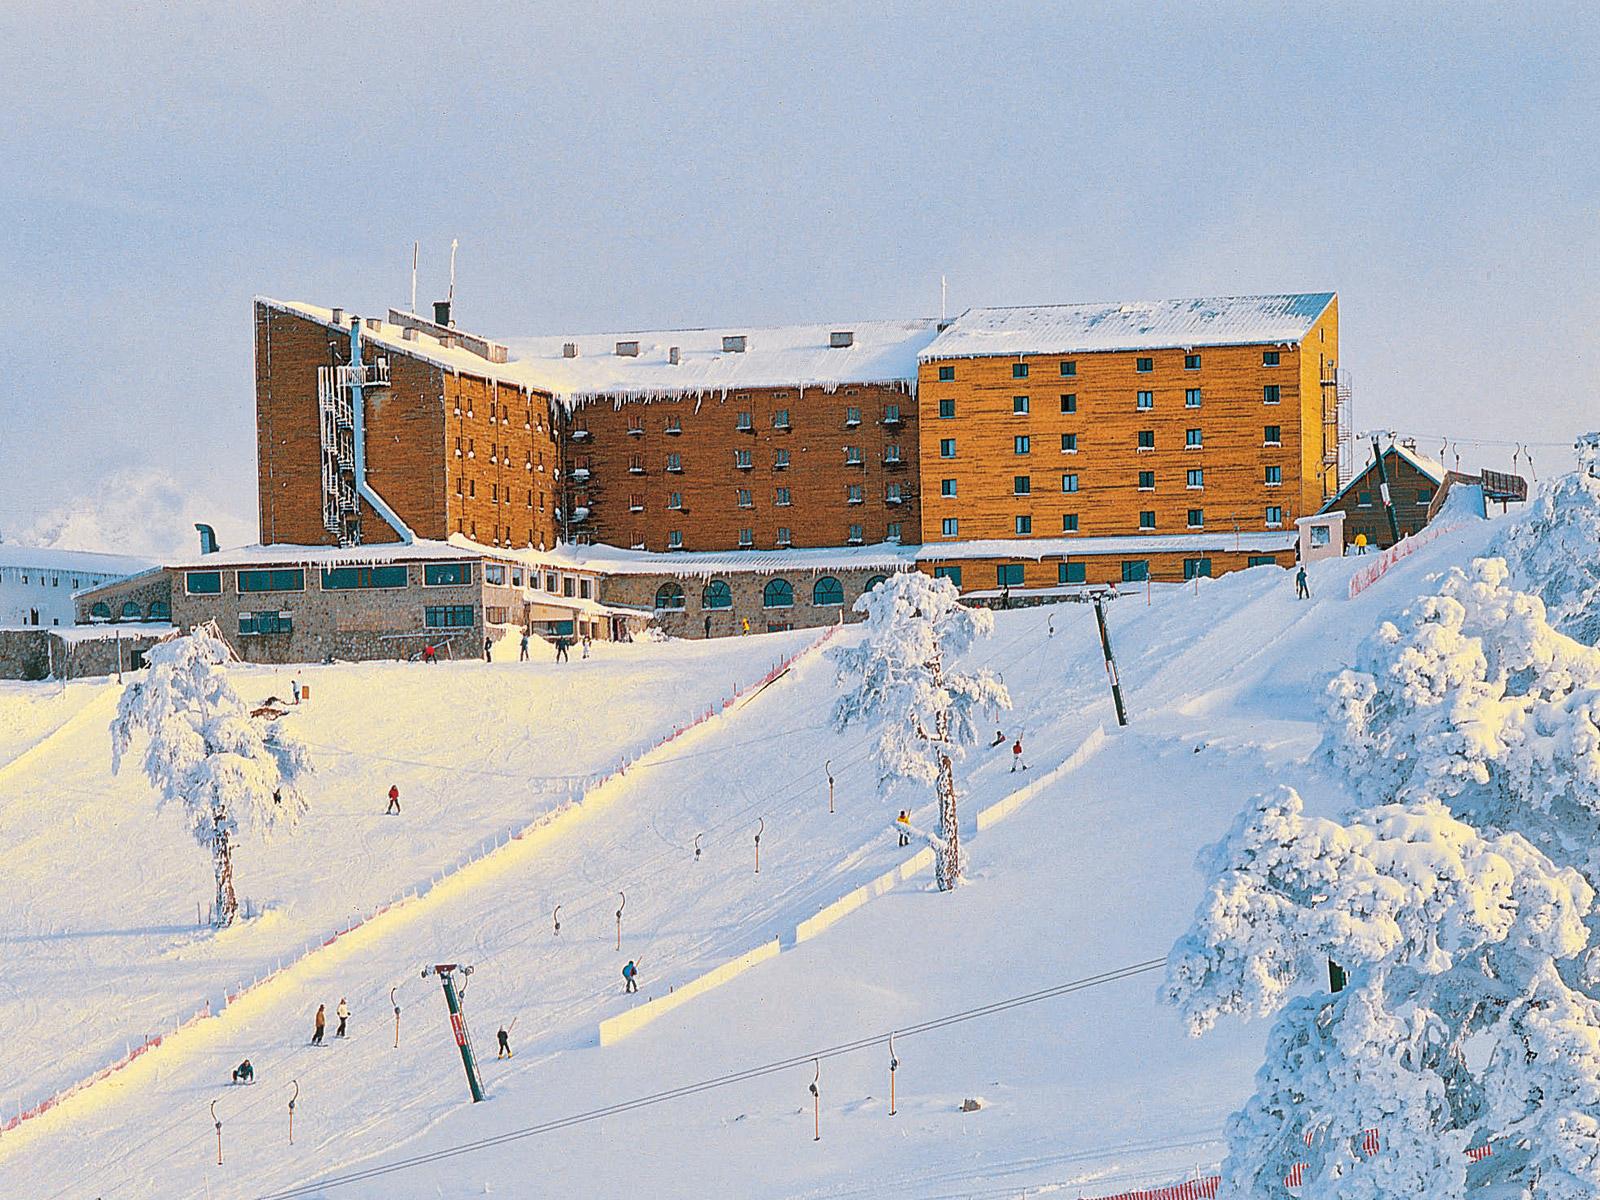 Dorukkaya Ski Mountain Resort